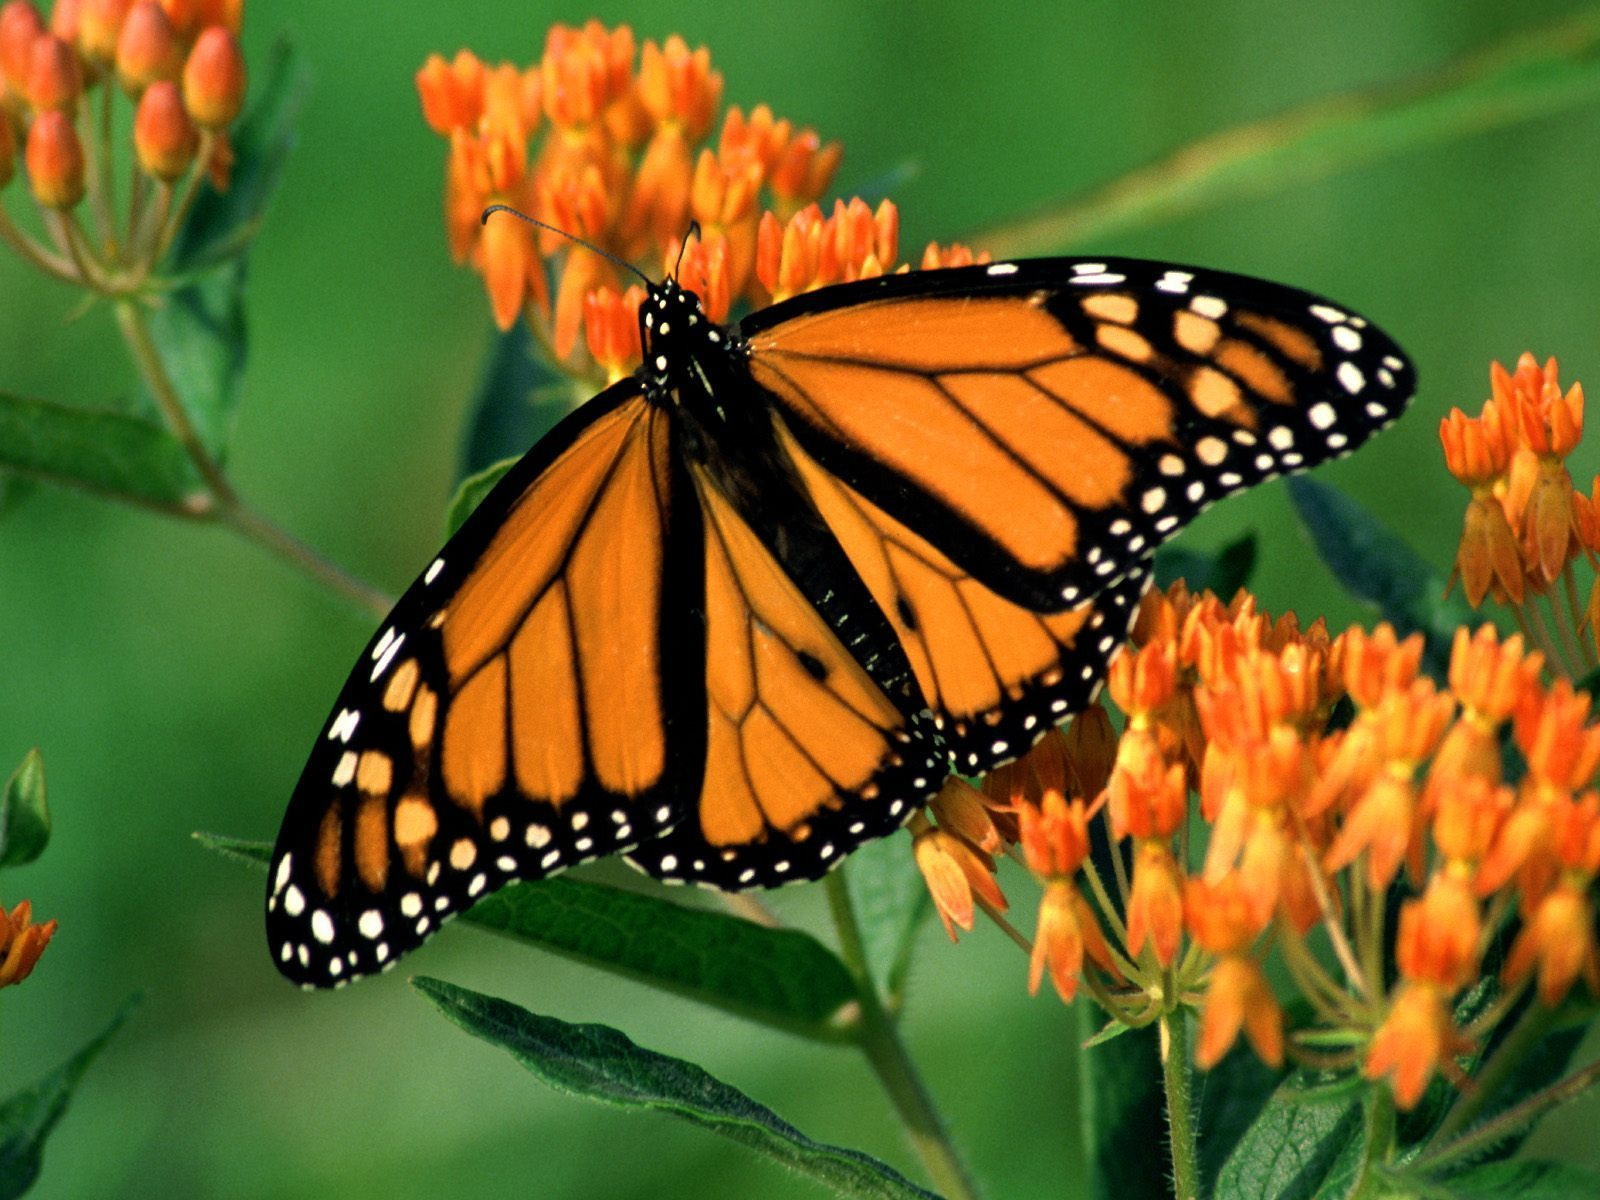 Beautiful butterflies butterflies wallpaper 9481947 for Butterfly in a flower